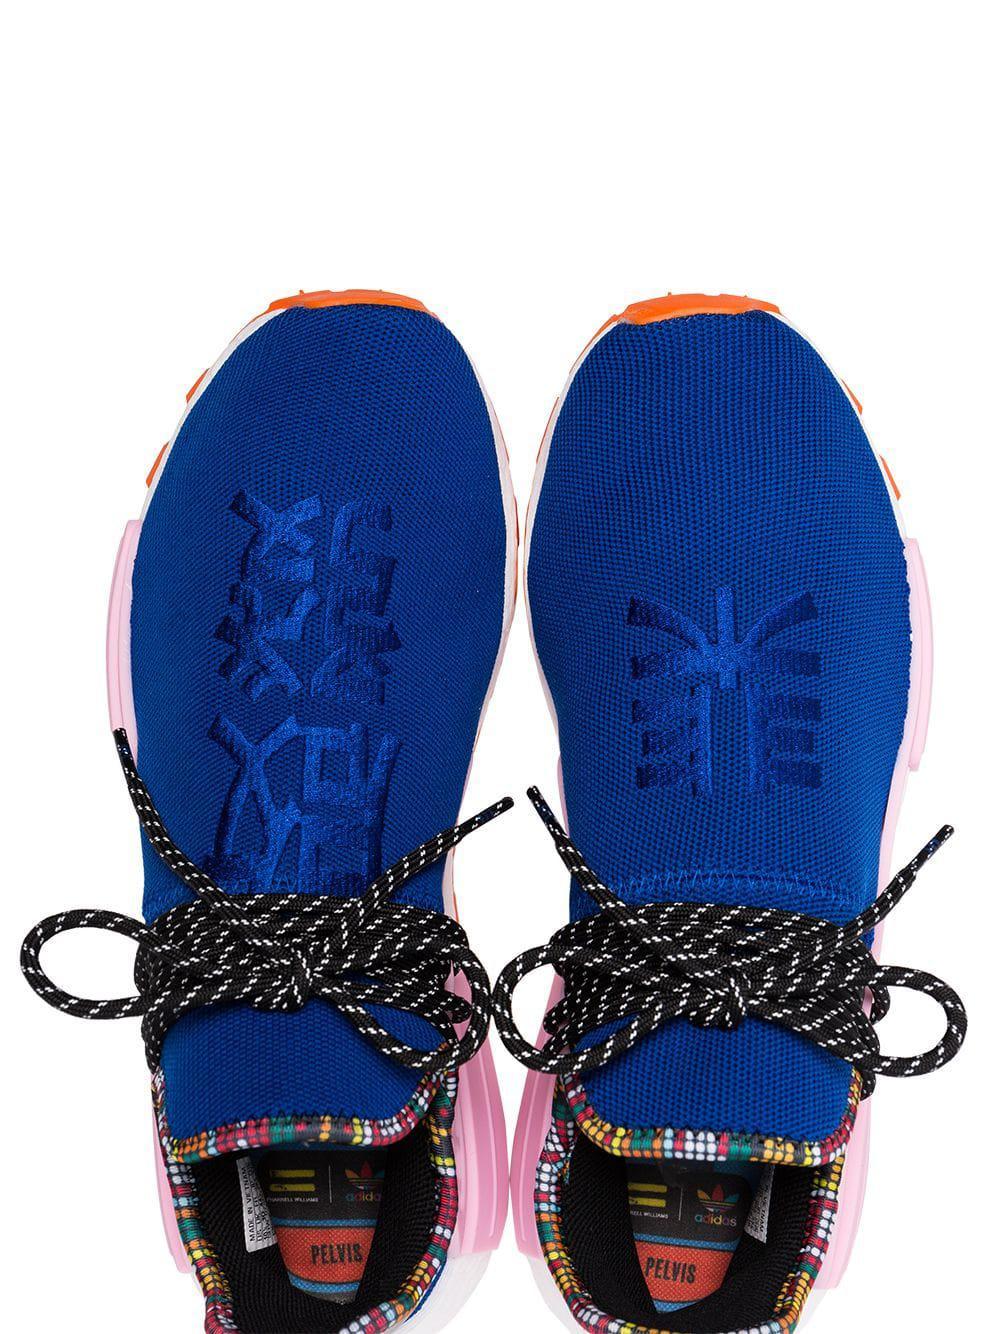 74da0a73c105a Lyst - adidas X Pharrell Williams Blue Human Body Nmd Sneakers in ...